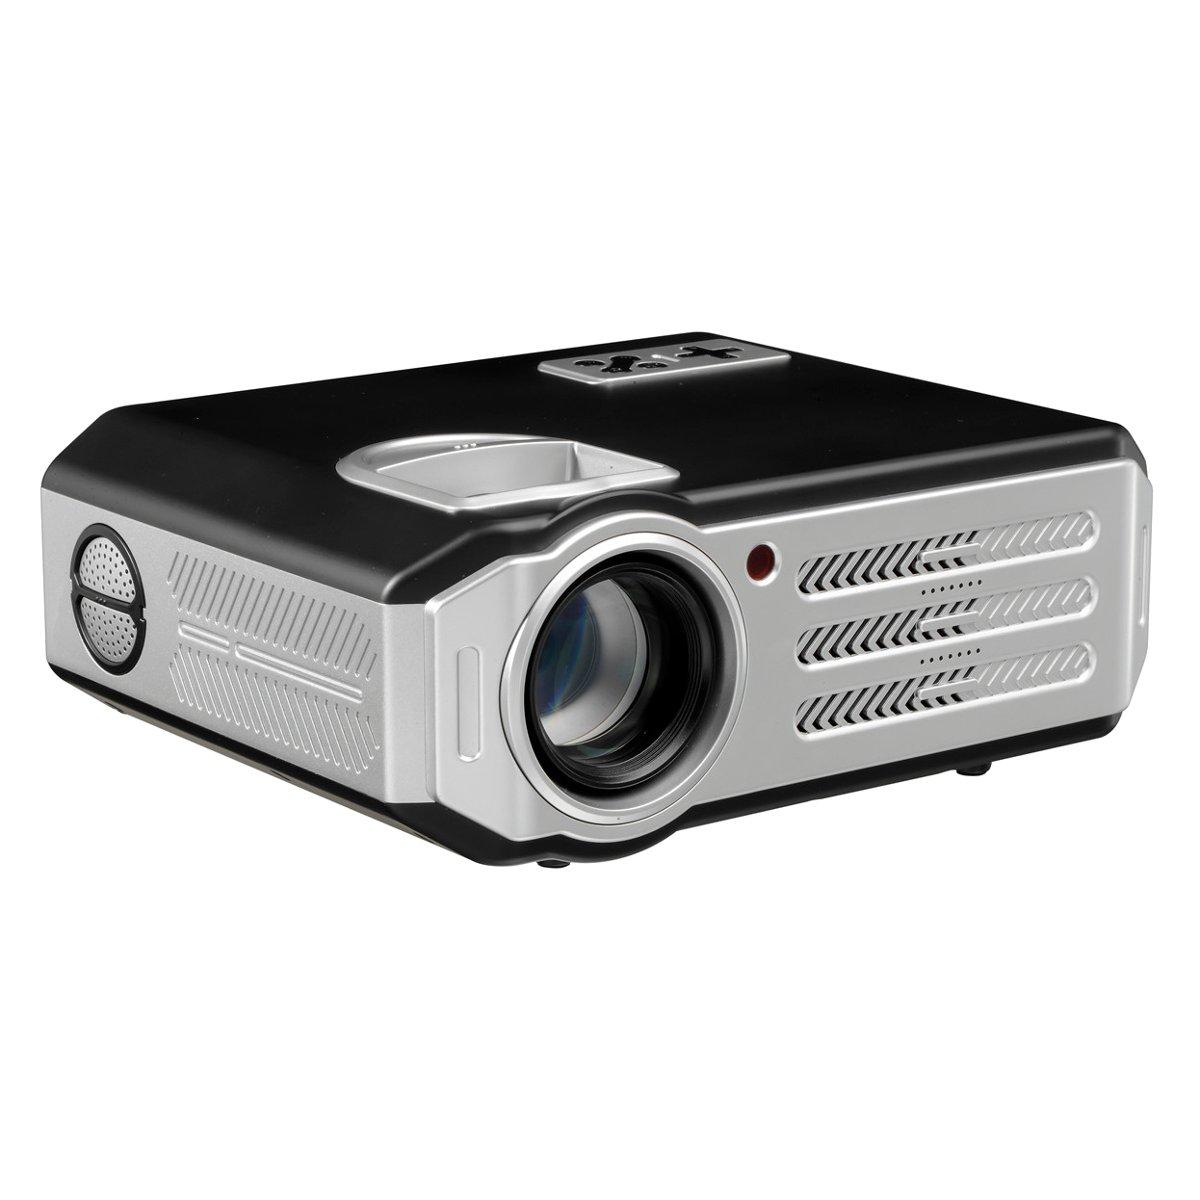 Projektor multimedialny LCD LED rzutnik Z6000 HDMI USB FullHD 50-180 cali + pilot